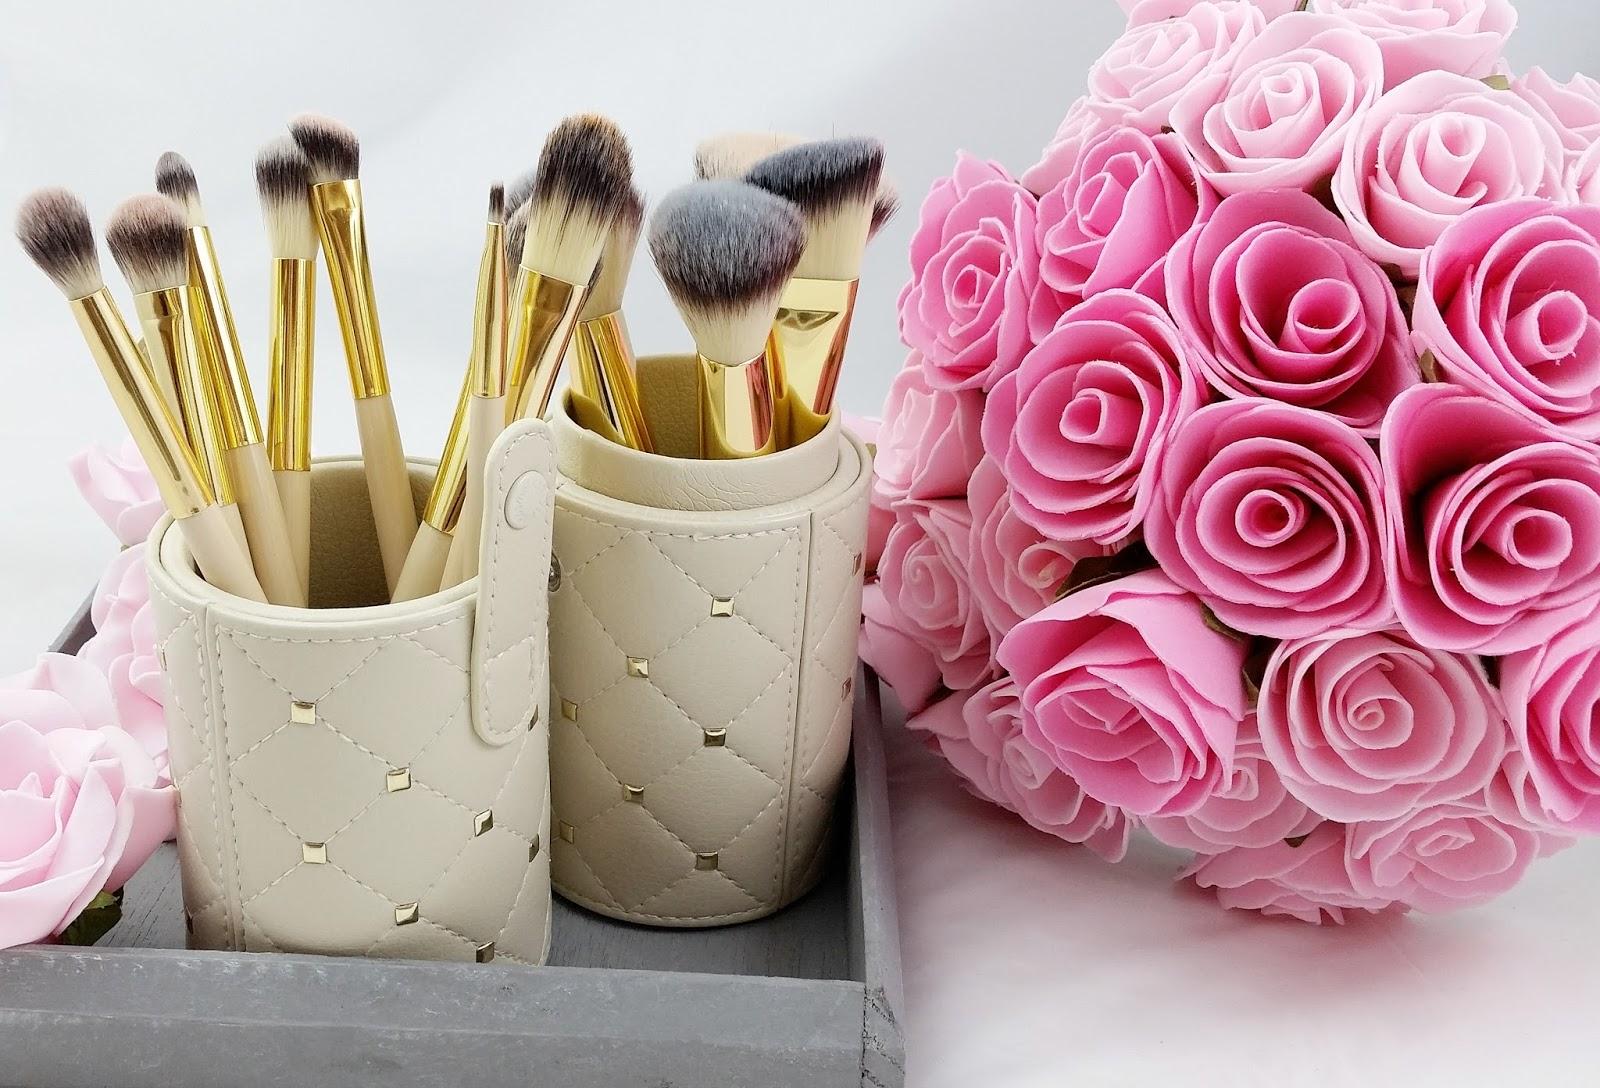 Bh Cosmetics Delivery Nr1 Stinaloves